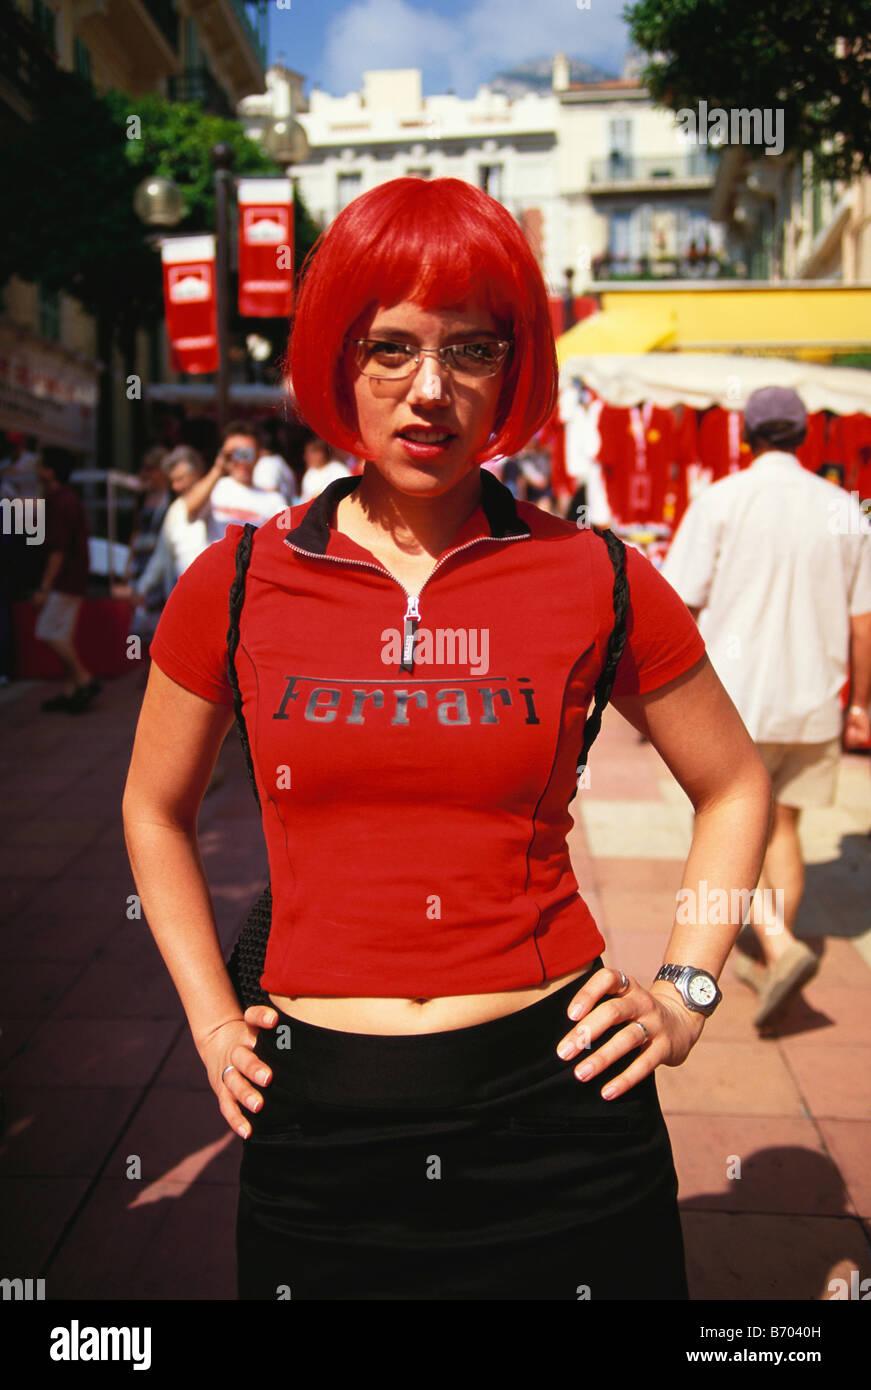 Fan de sport automobile féminin, Grand Prix de Formule 1, F1, Monte Carlo, Monaco, Europa Photo Stock